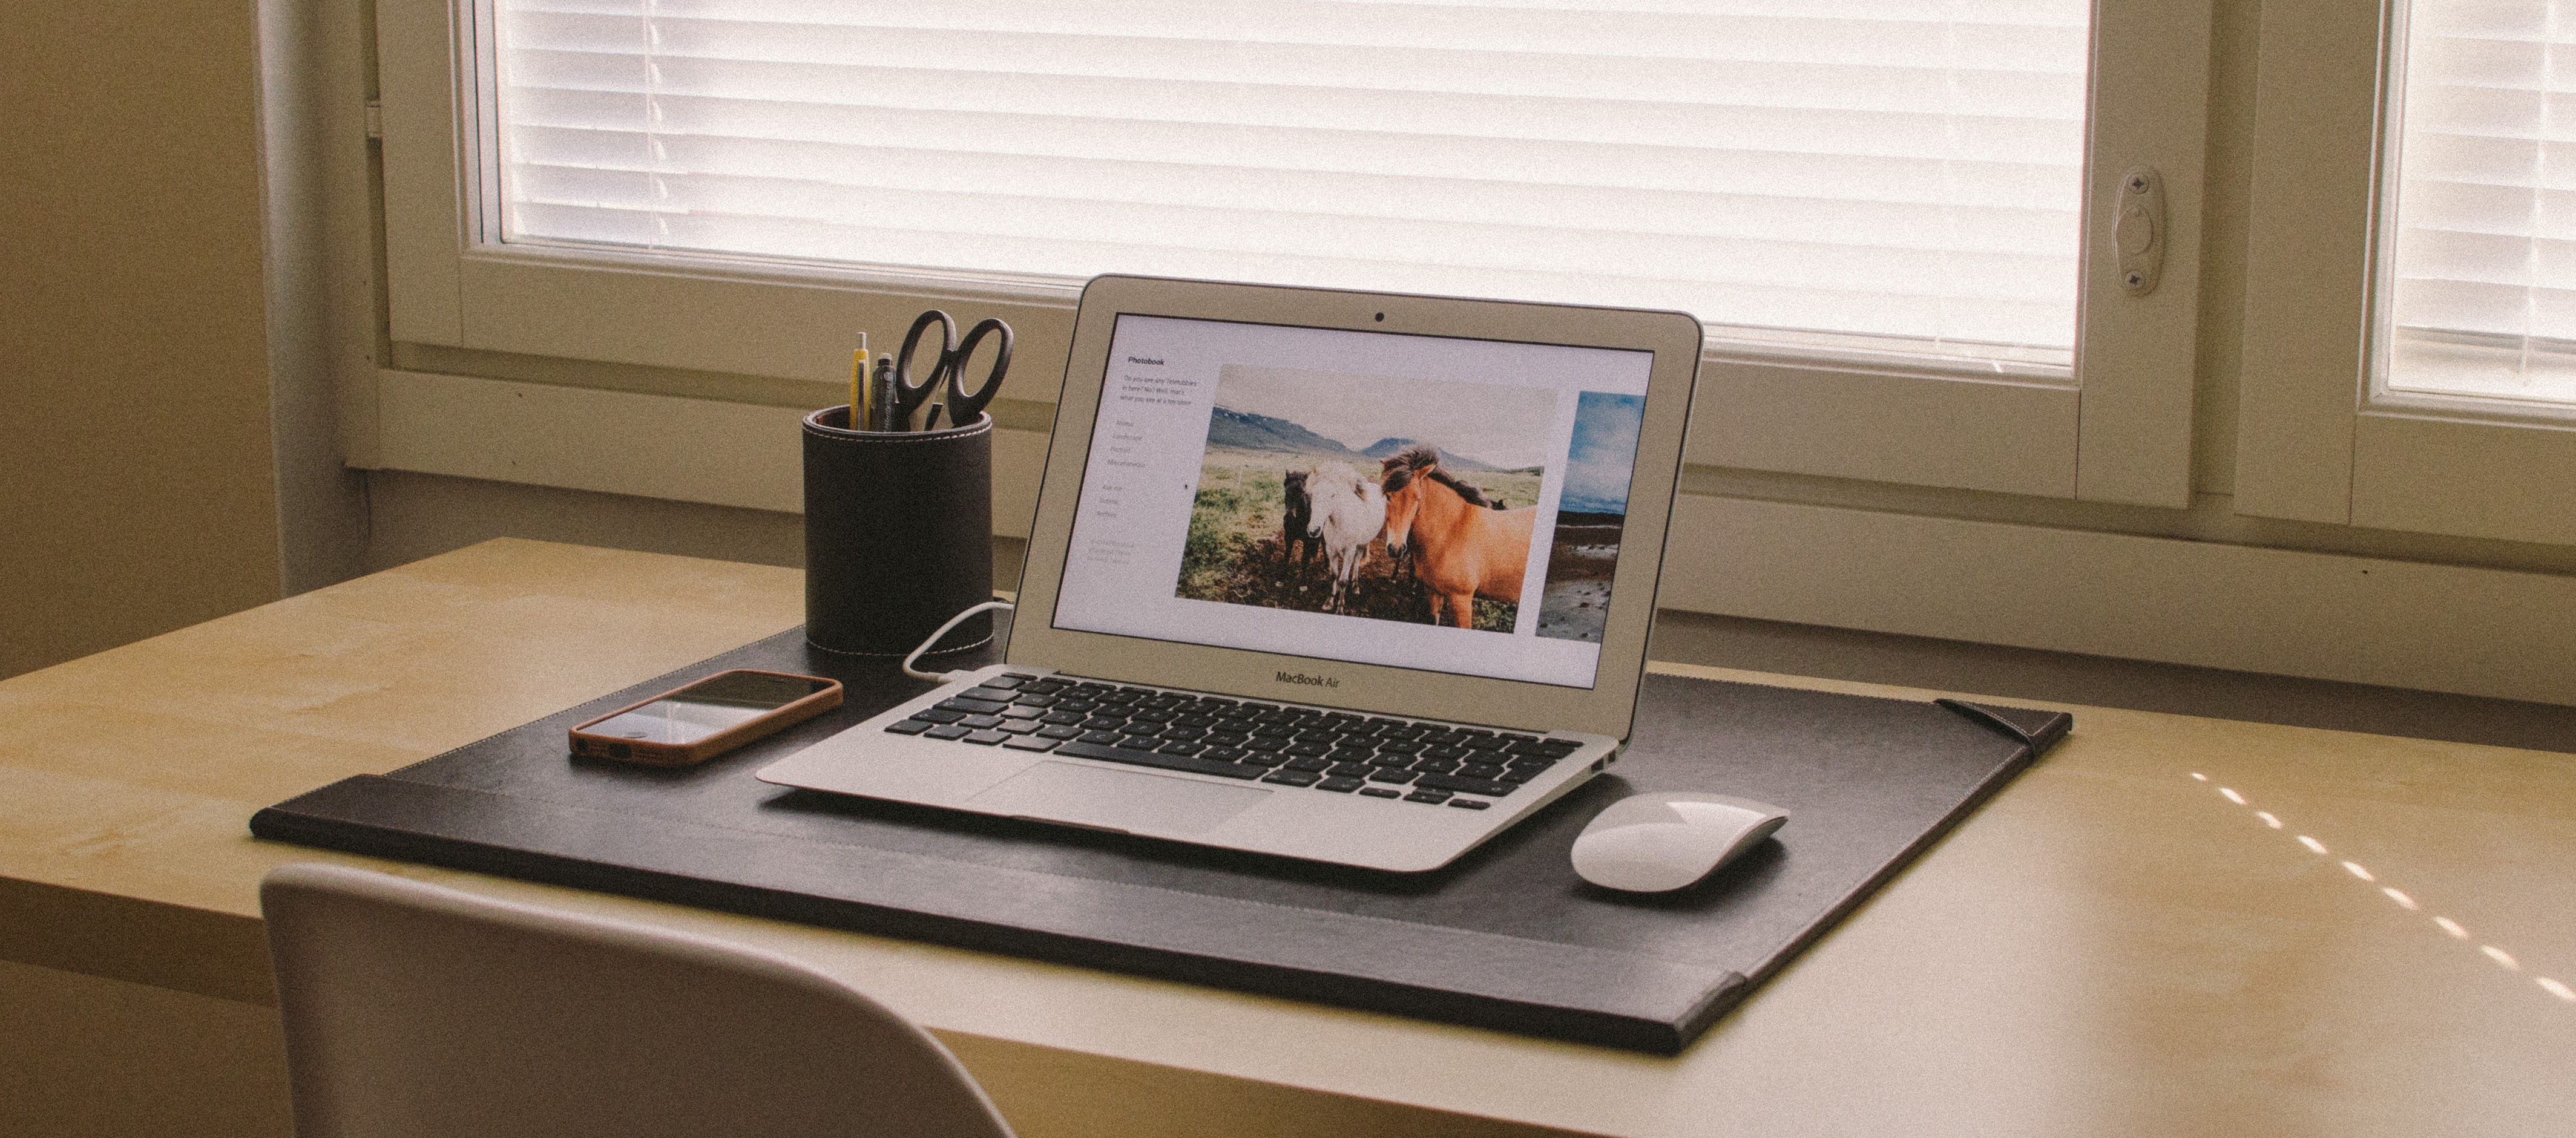 apple-iphone-smartphone-desk.jpg